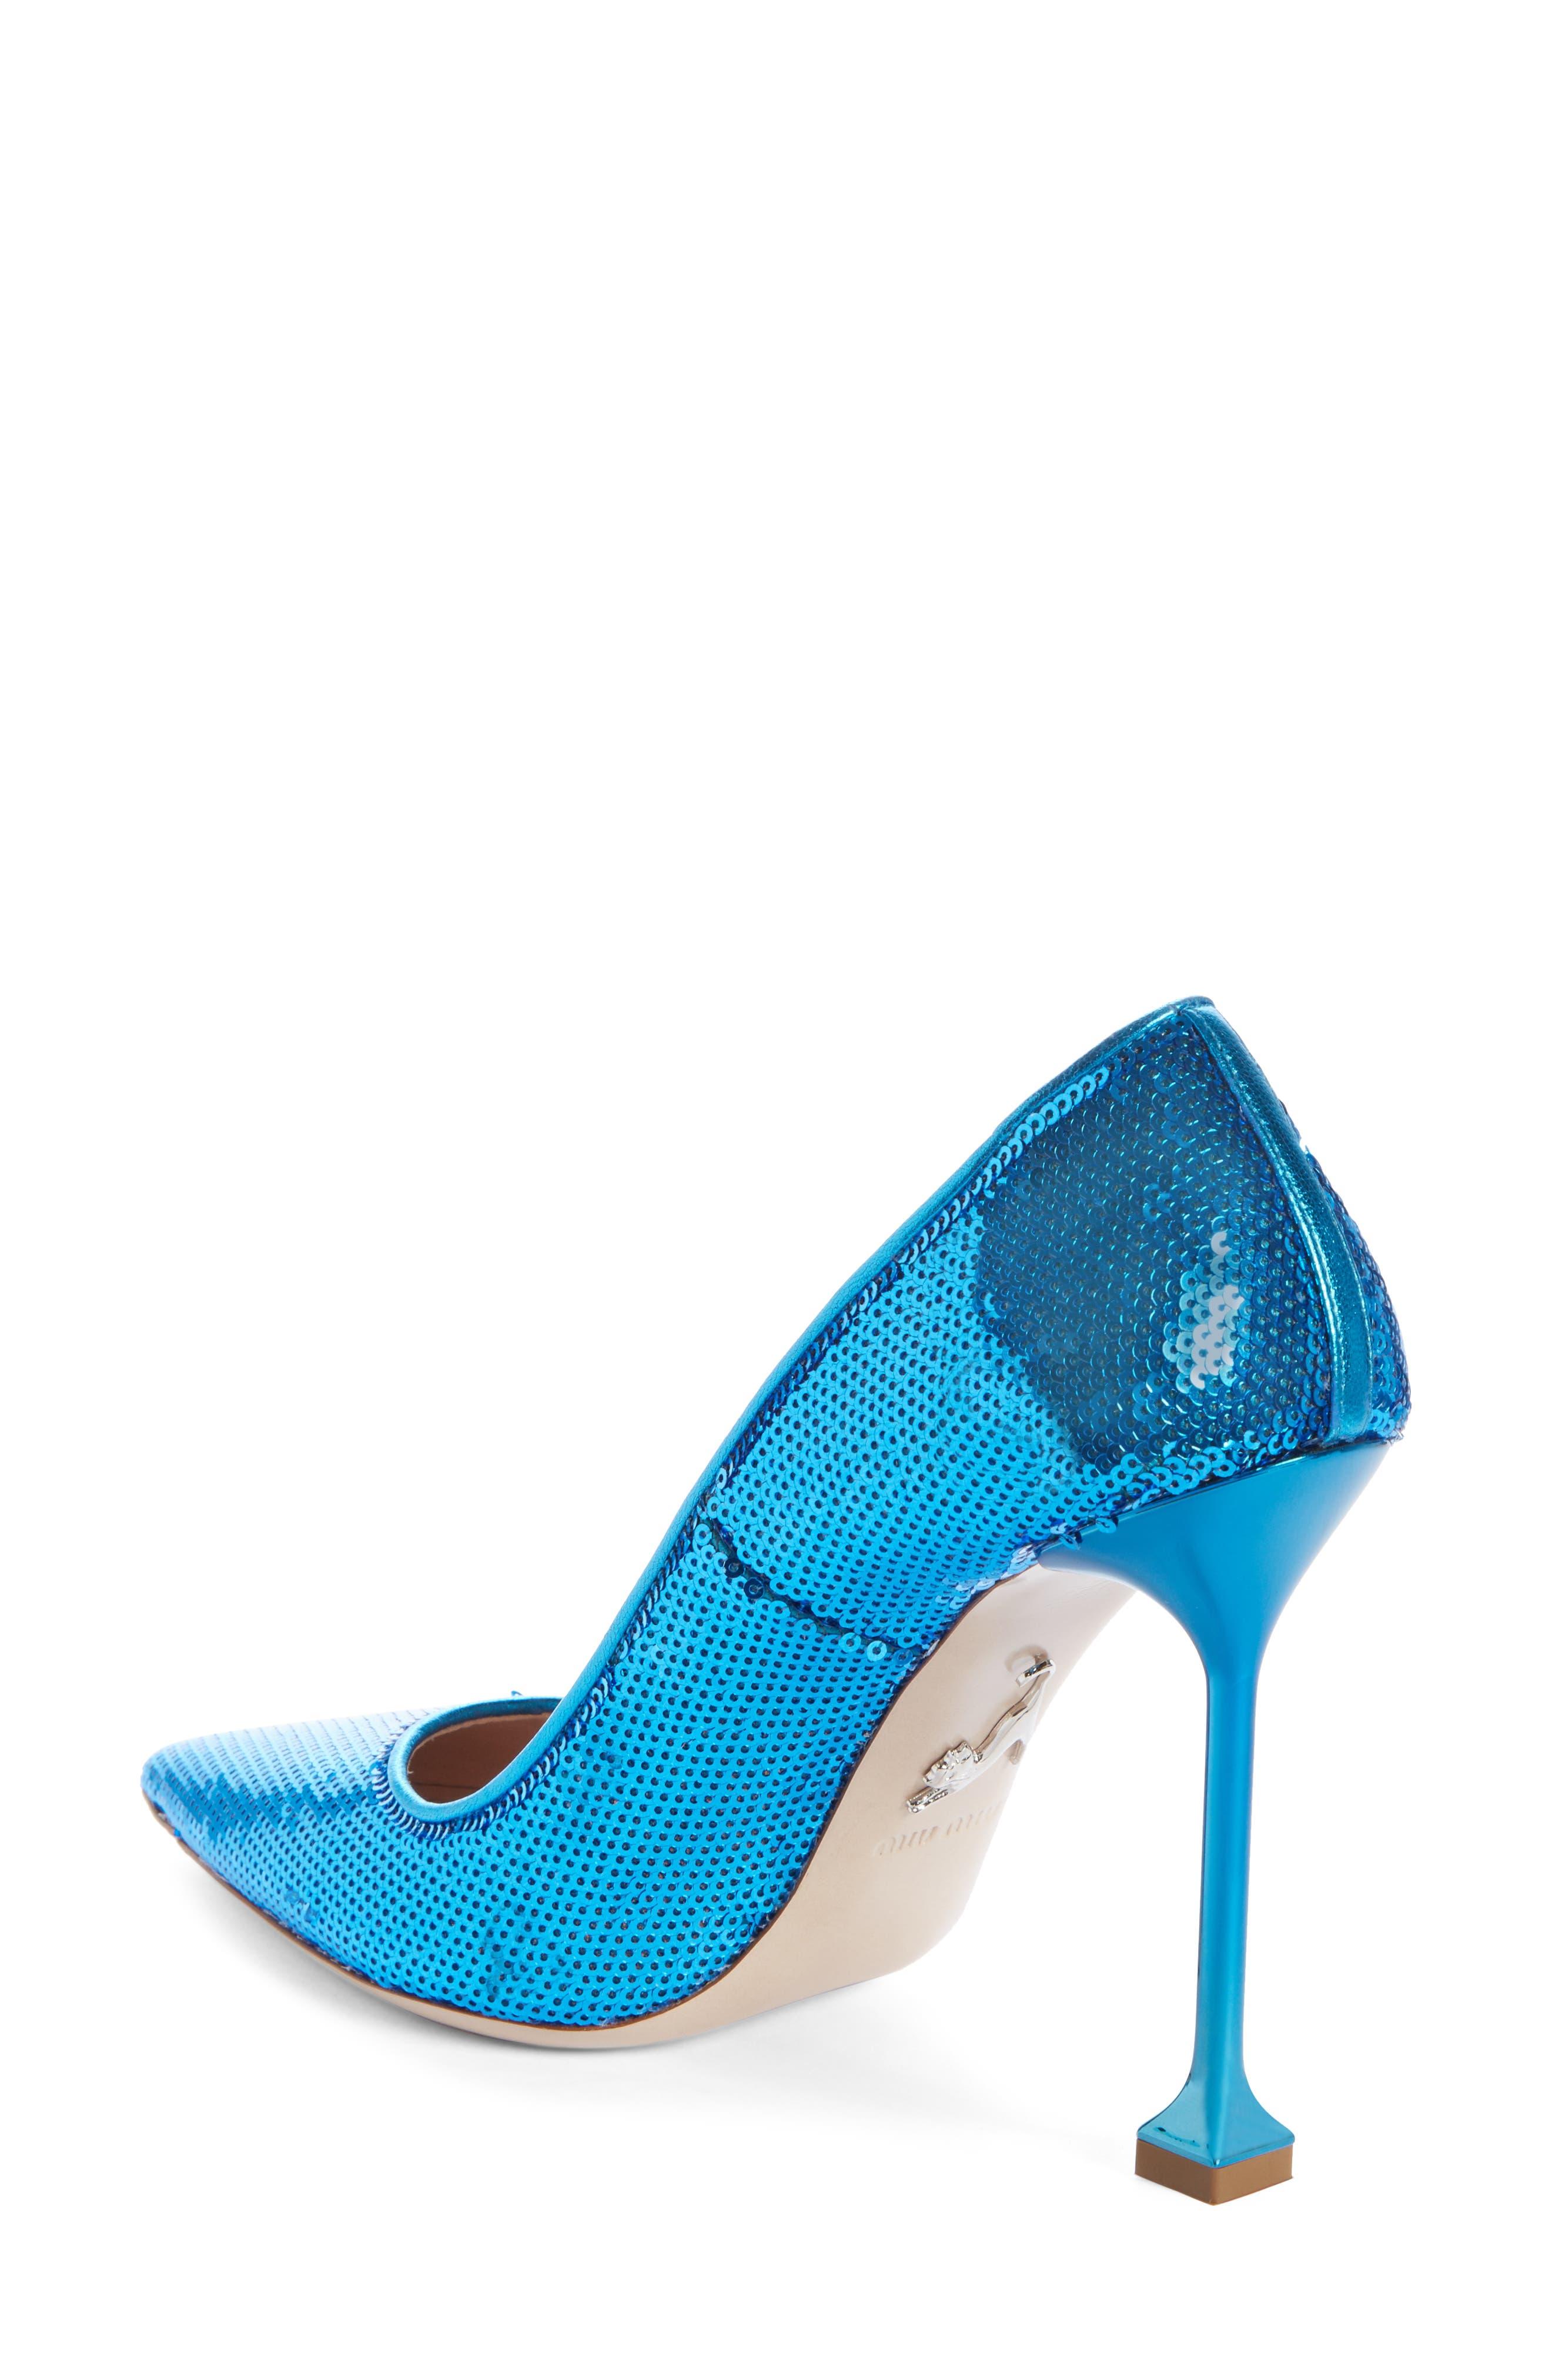 Sequin Pin Heel Pump,                             Alternate thumbnail 2, color,                             MAREA BLUE